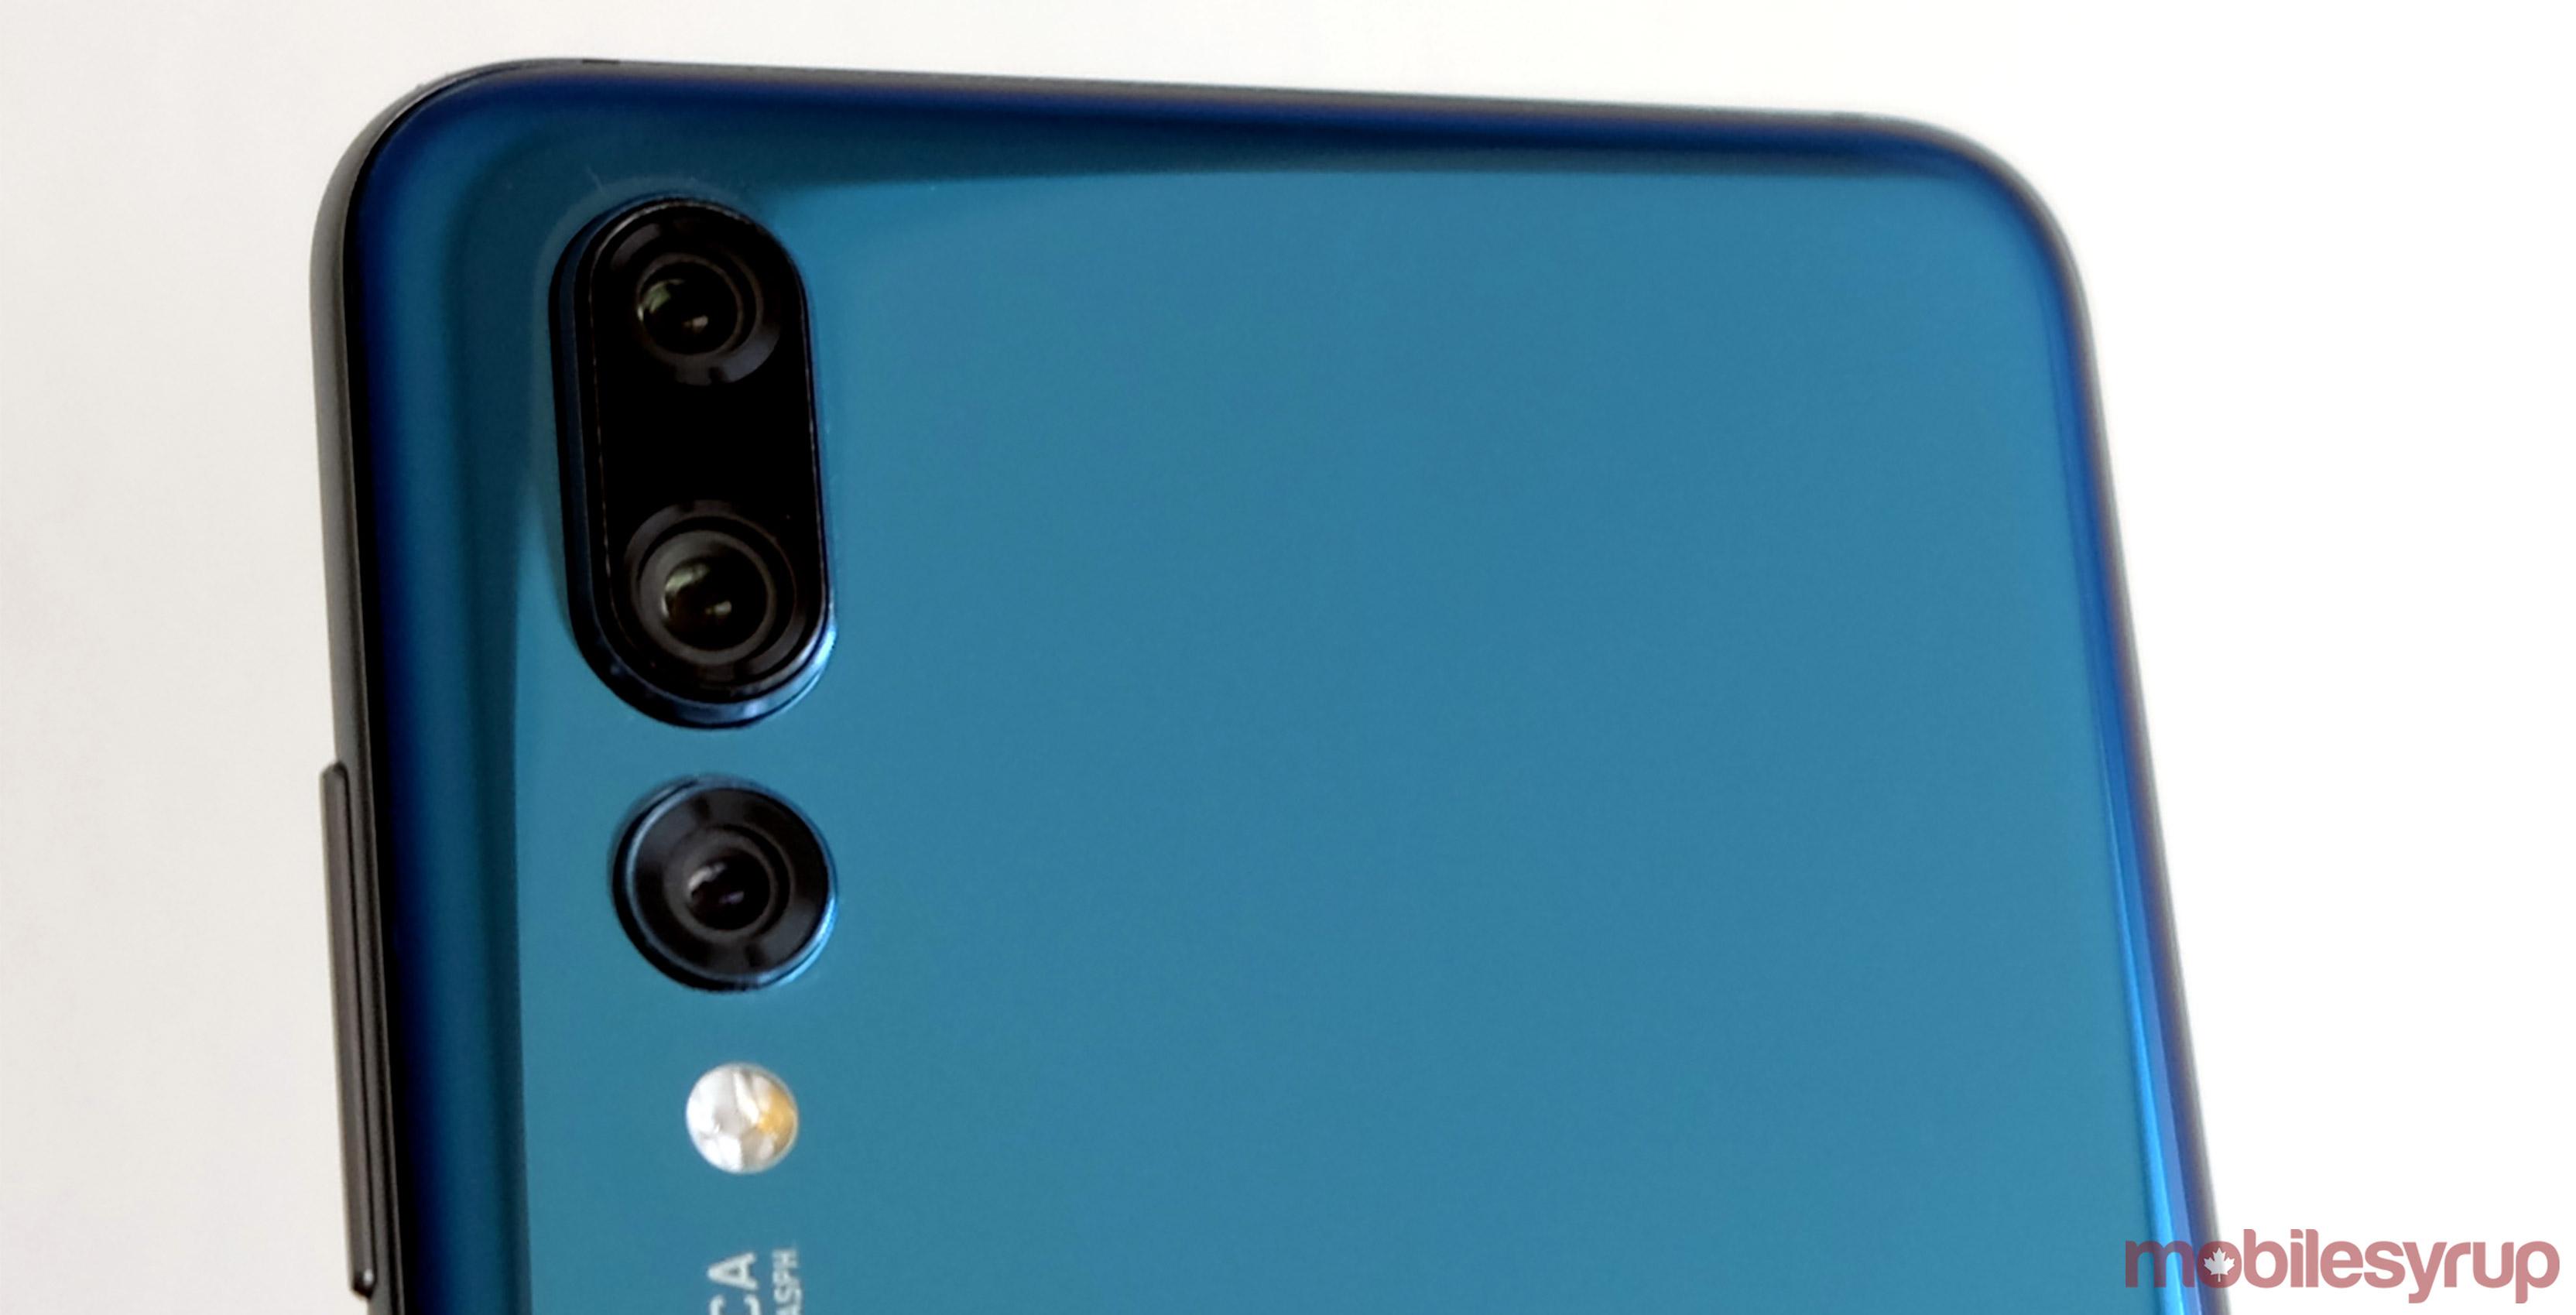 Huawei P20 Pro rear